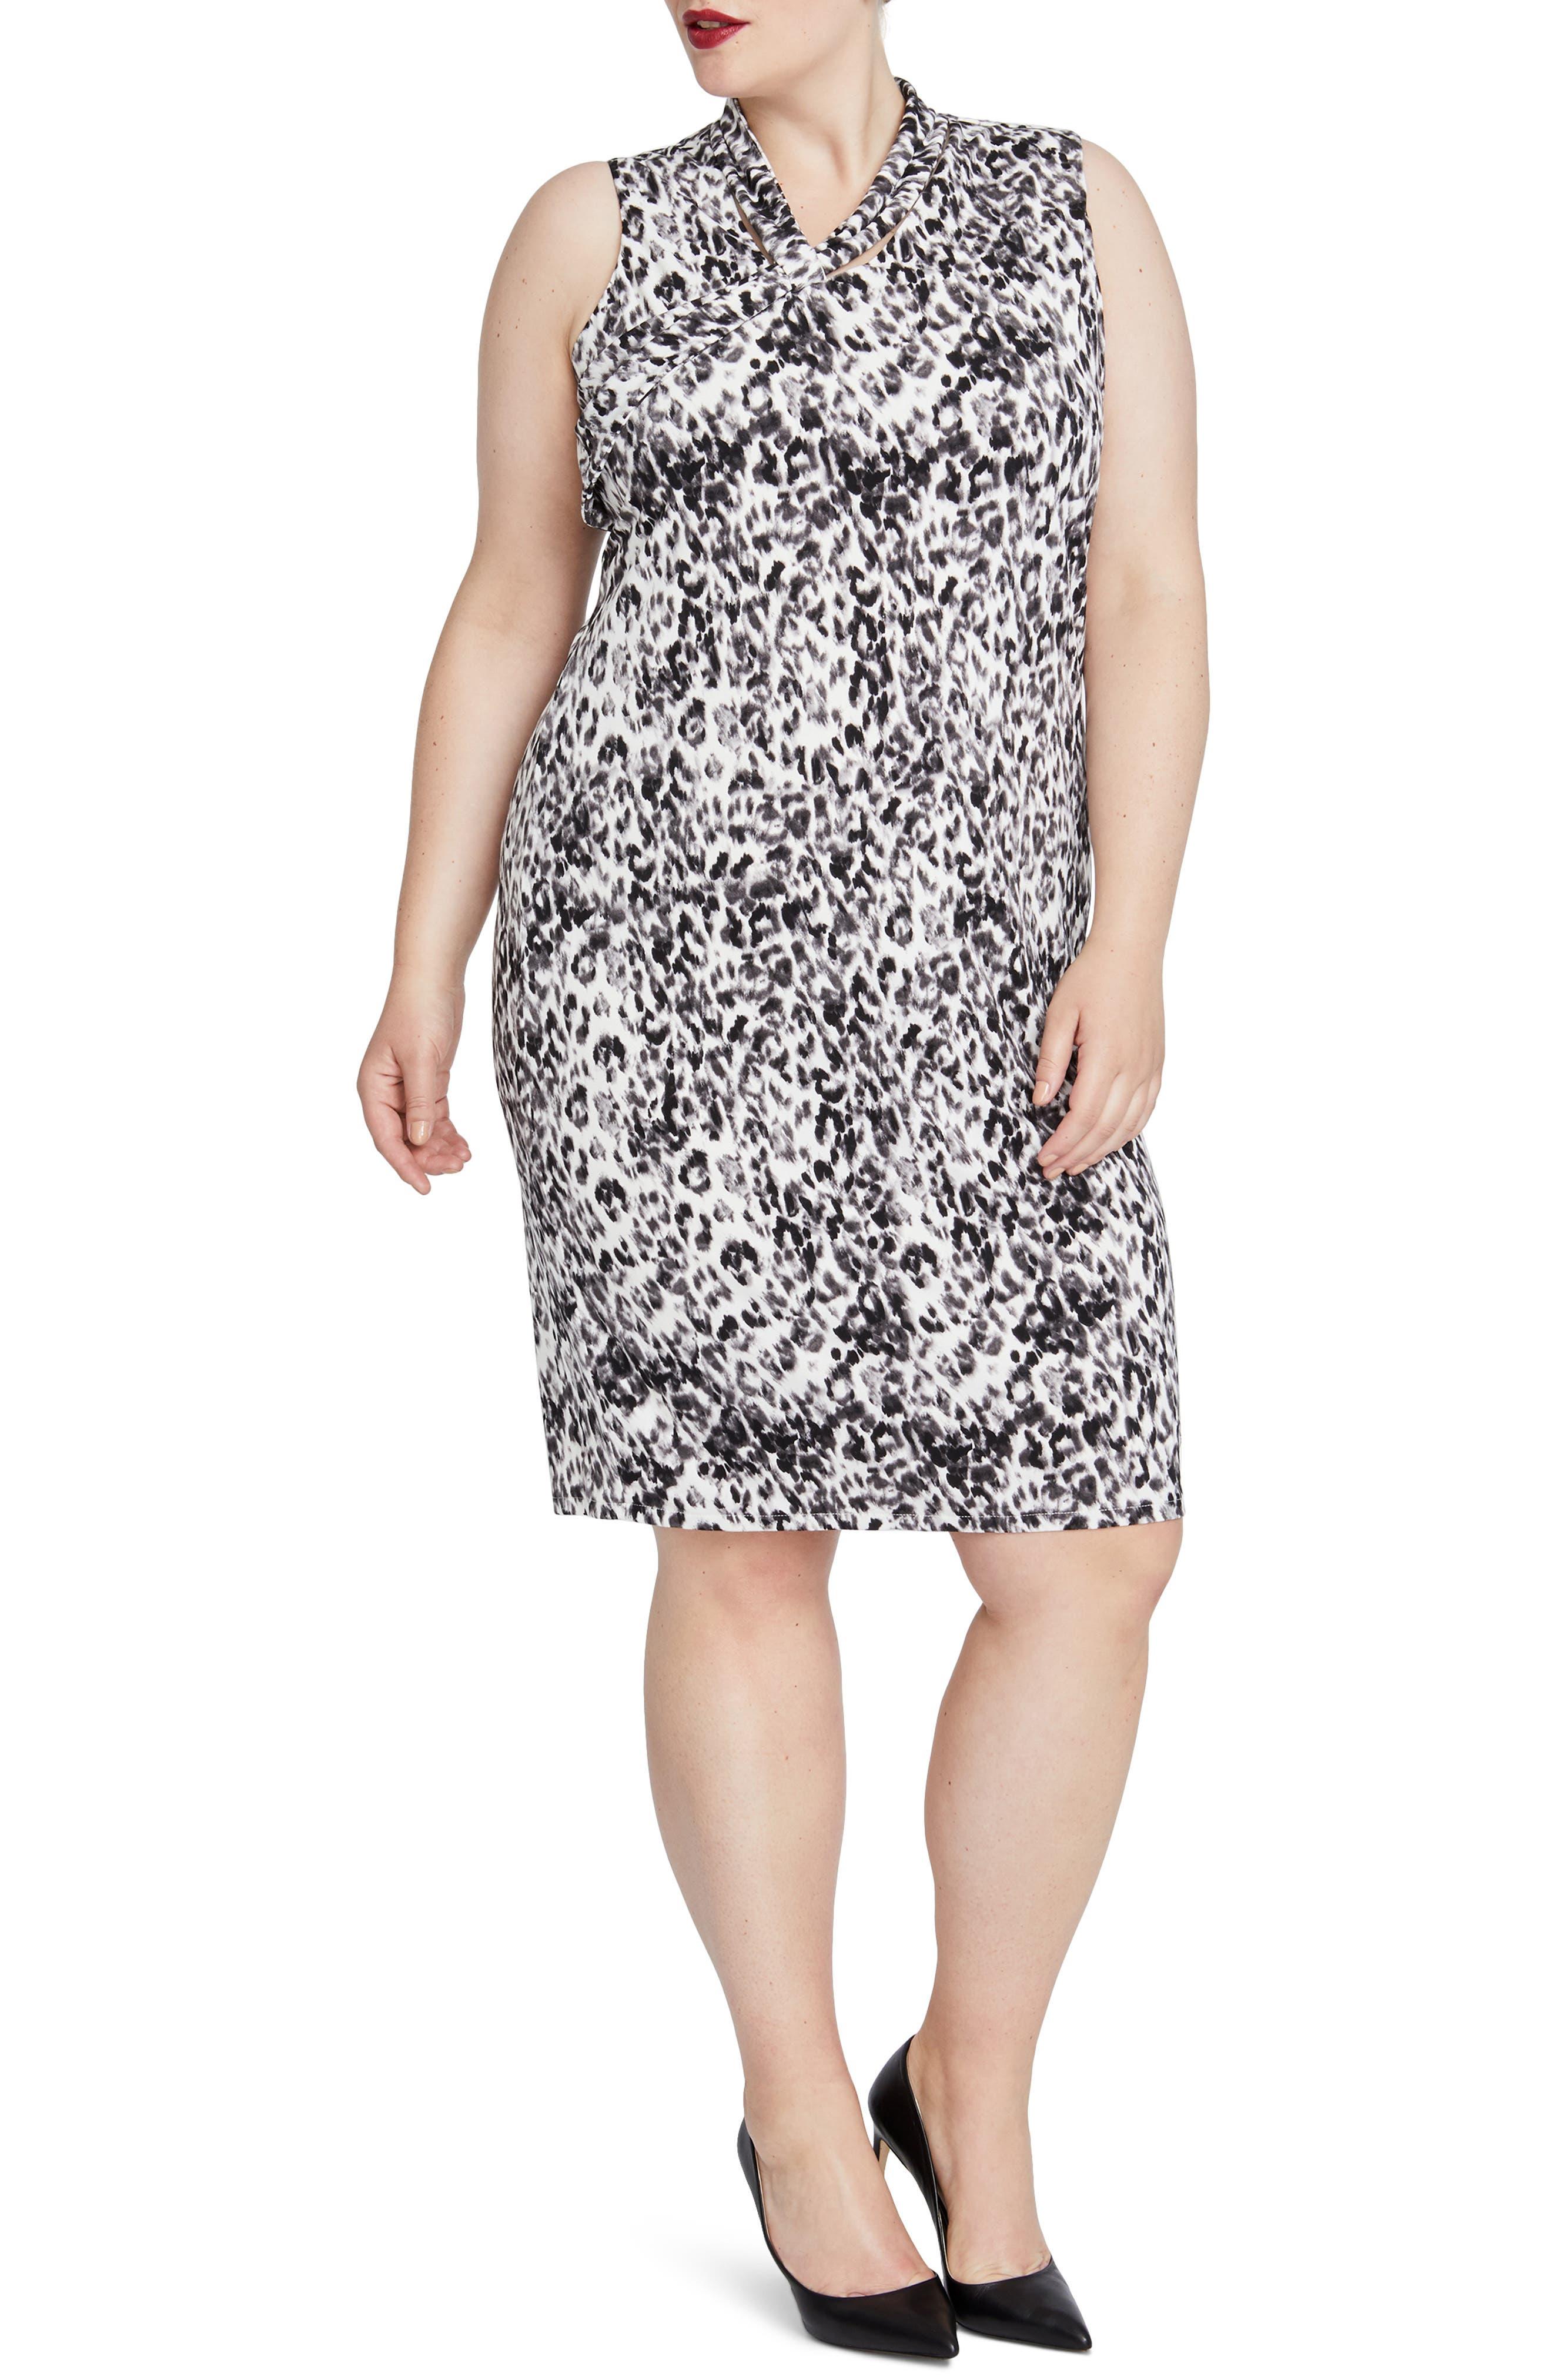 Axel Leopard Print Dress,                         Main,                         color, 001